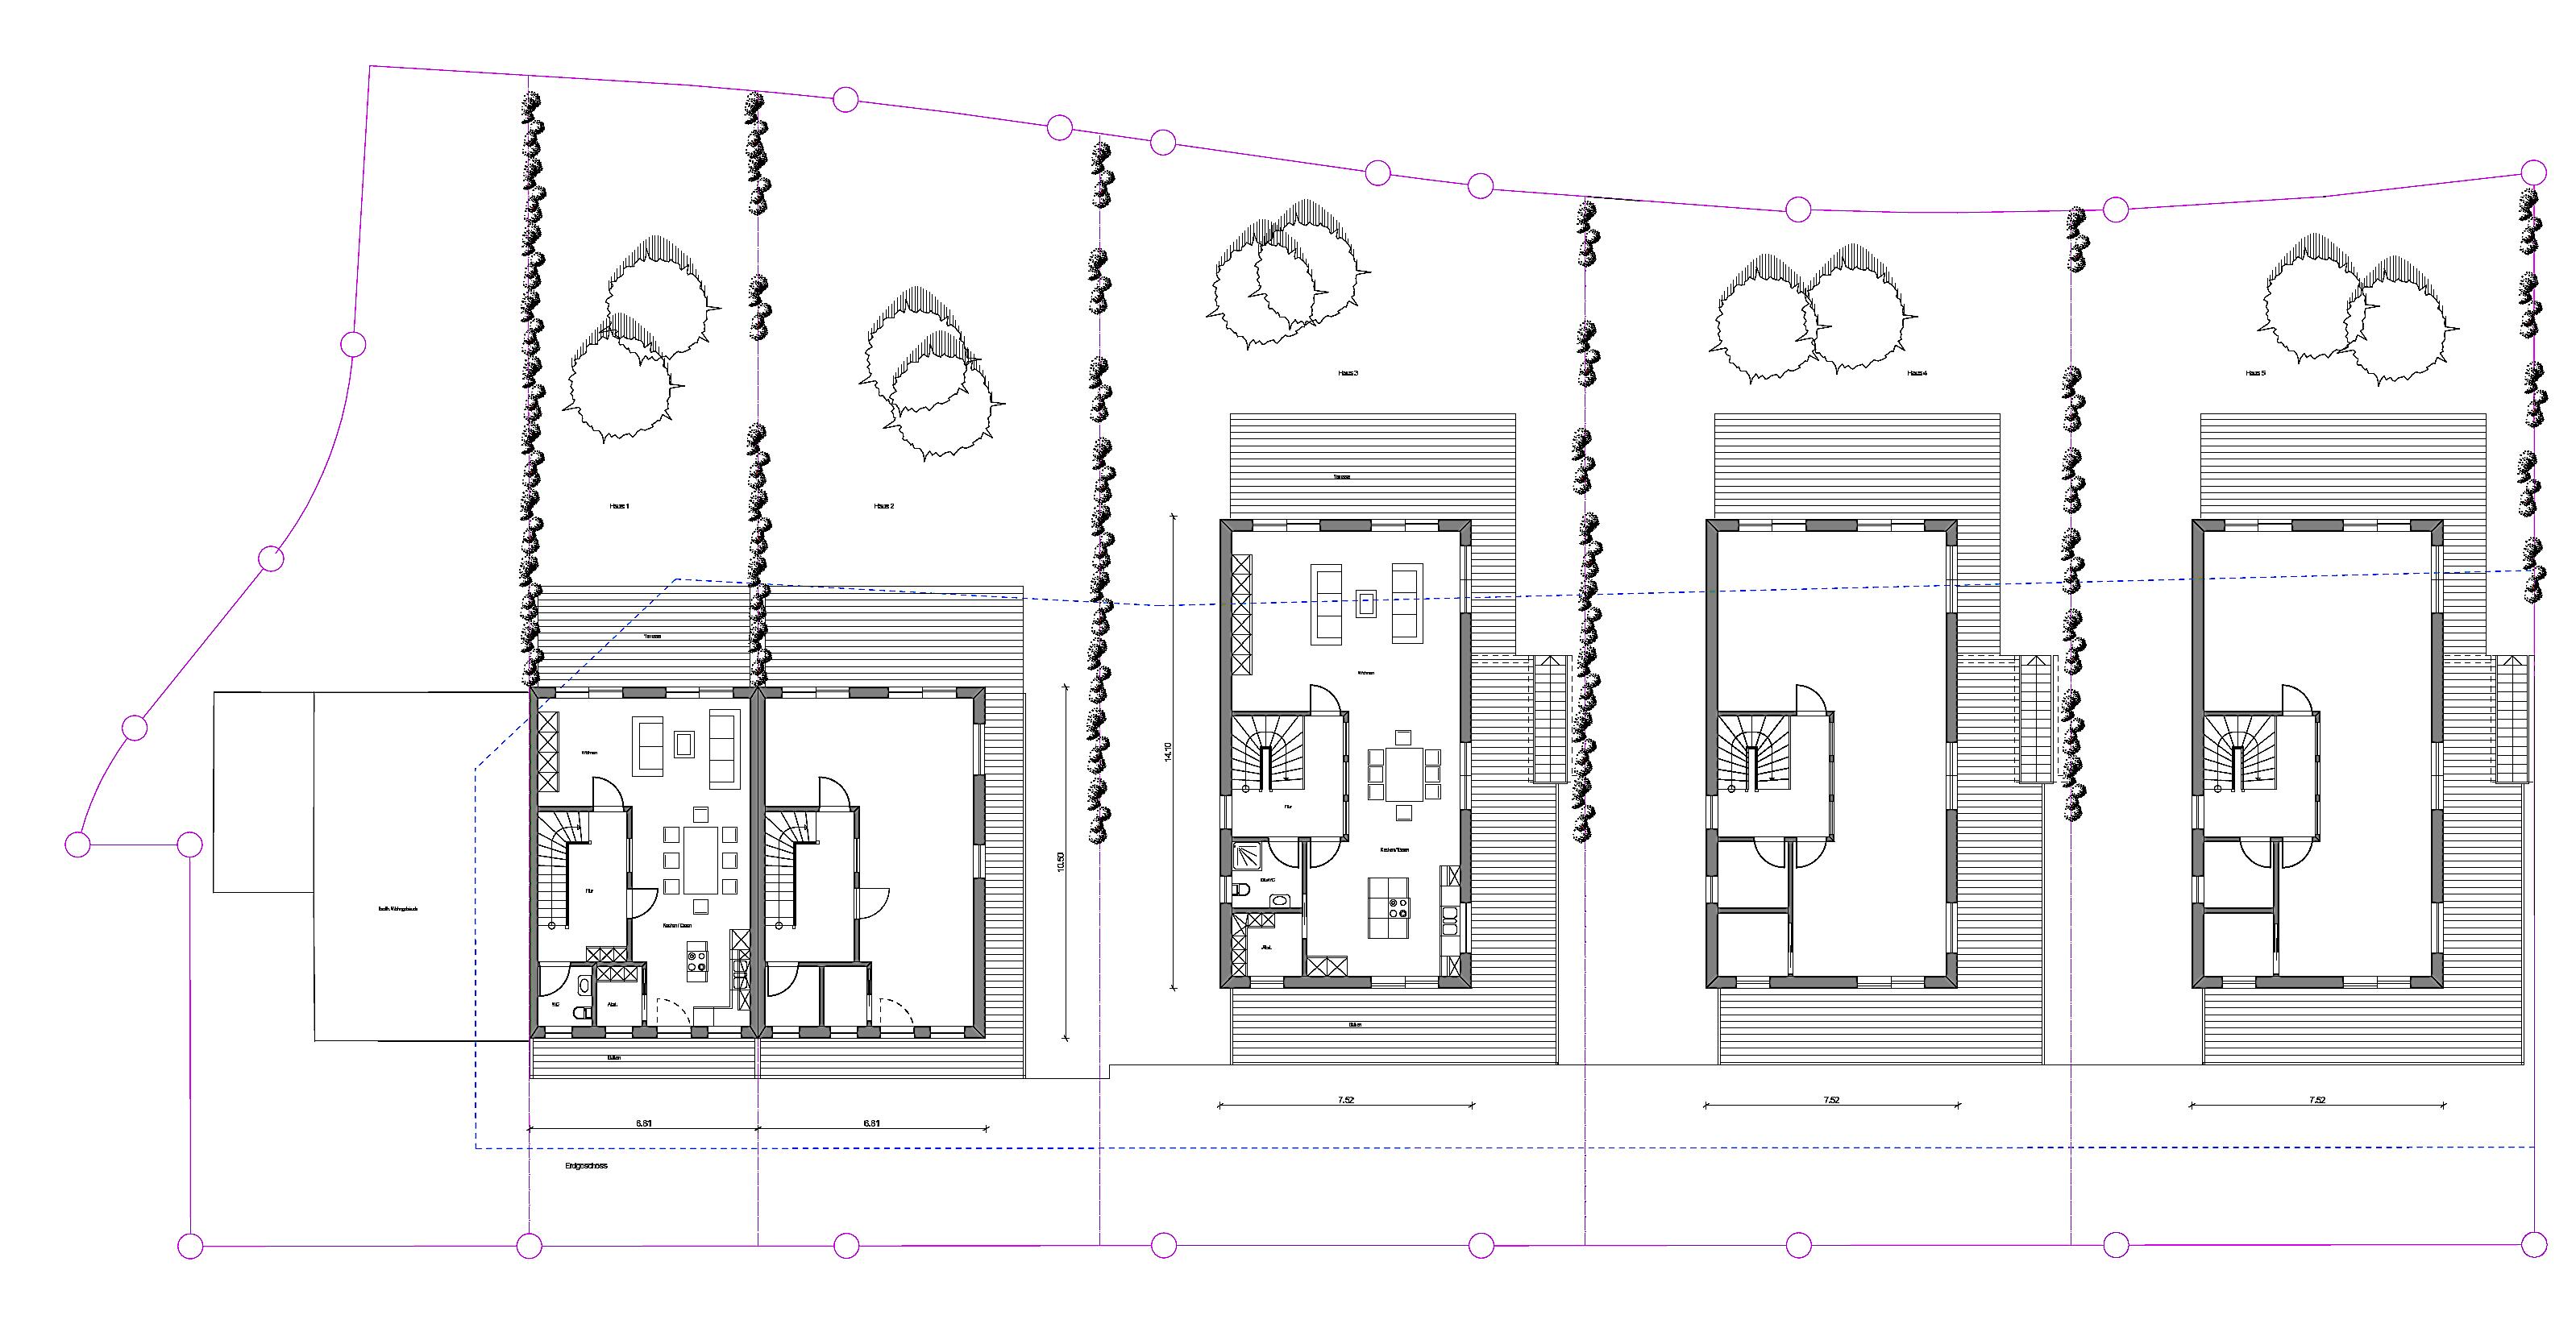 immobilien zimmerei schmid m hringen. Black Bedroom Furniture Sets. Home Design Ideas